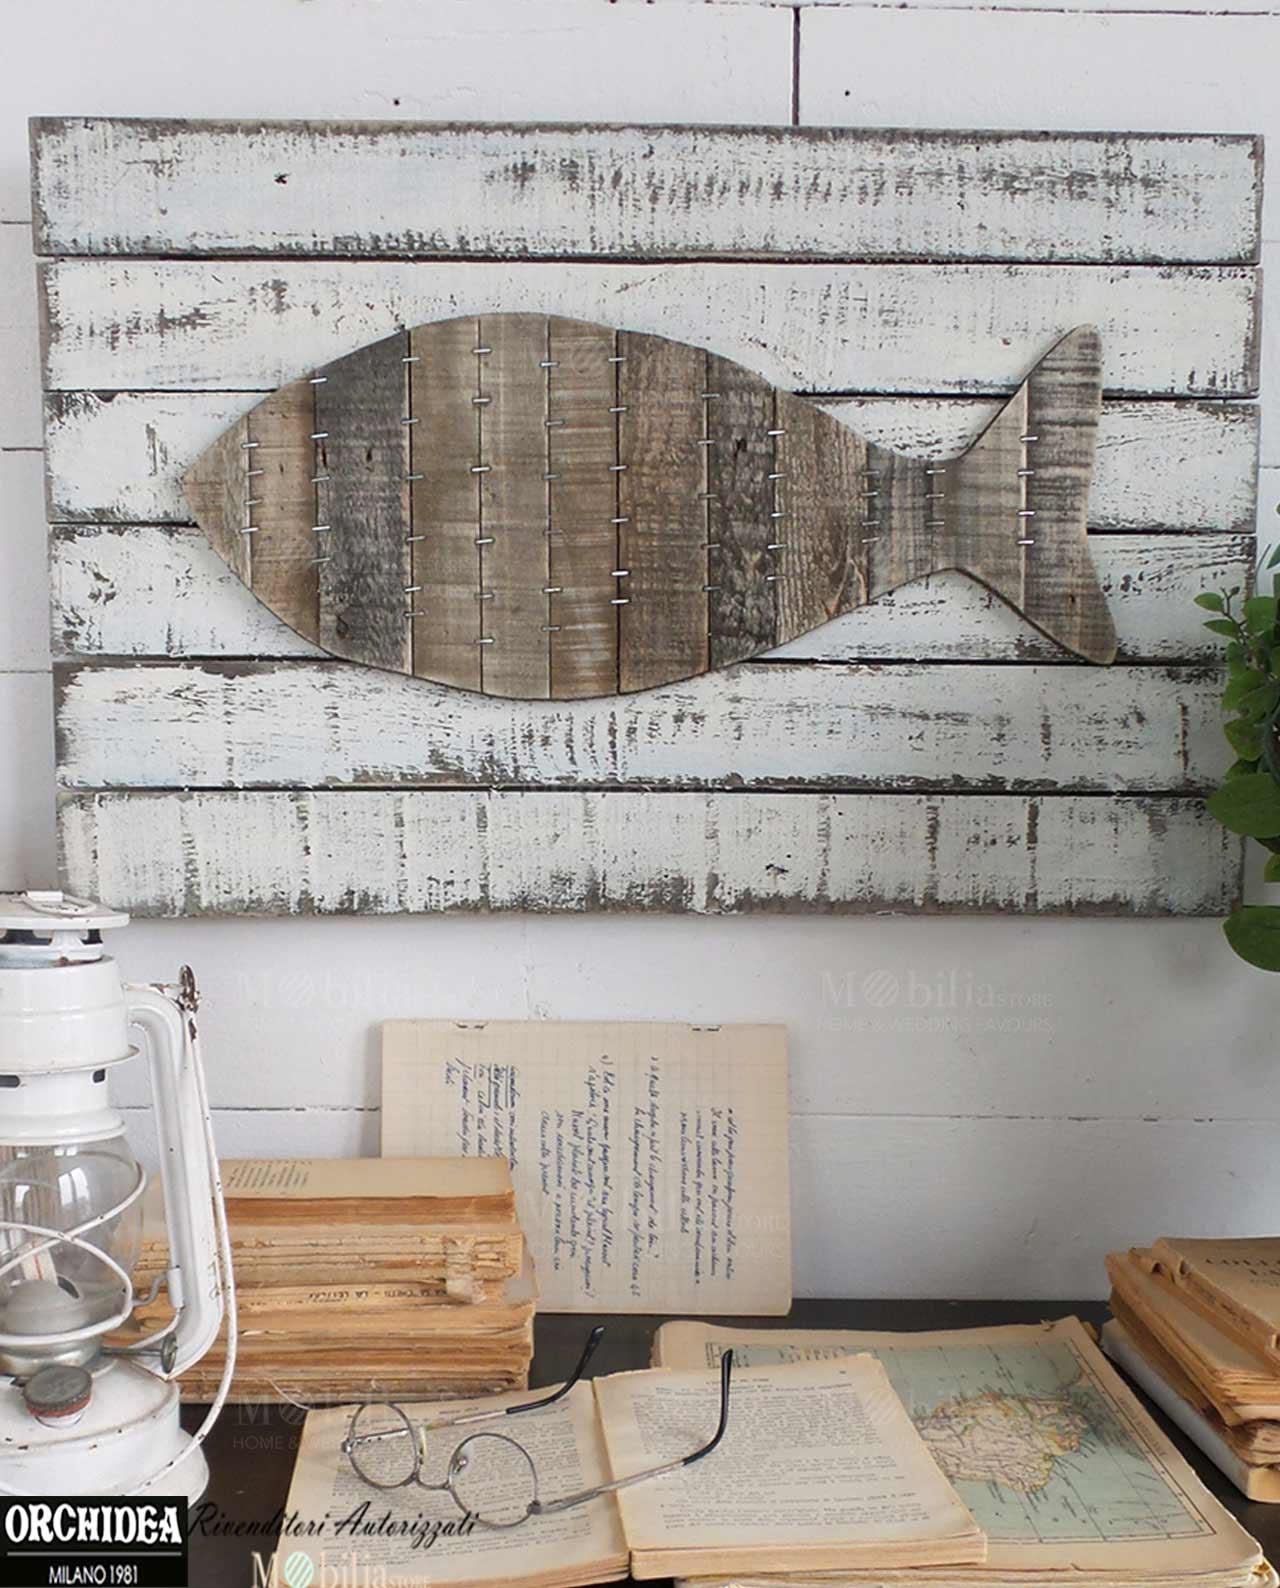 Pannelli decorativi da parete vintage pesce mobilia store home favours - Pannelli decorativi pareti ...